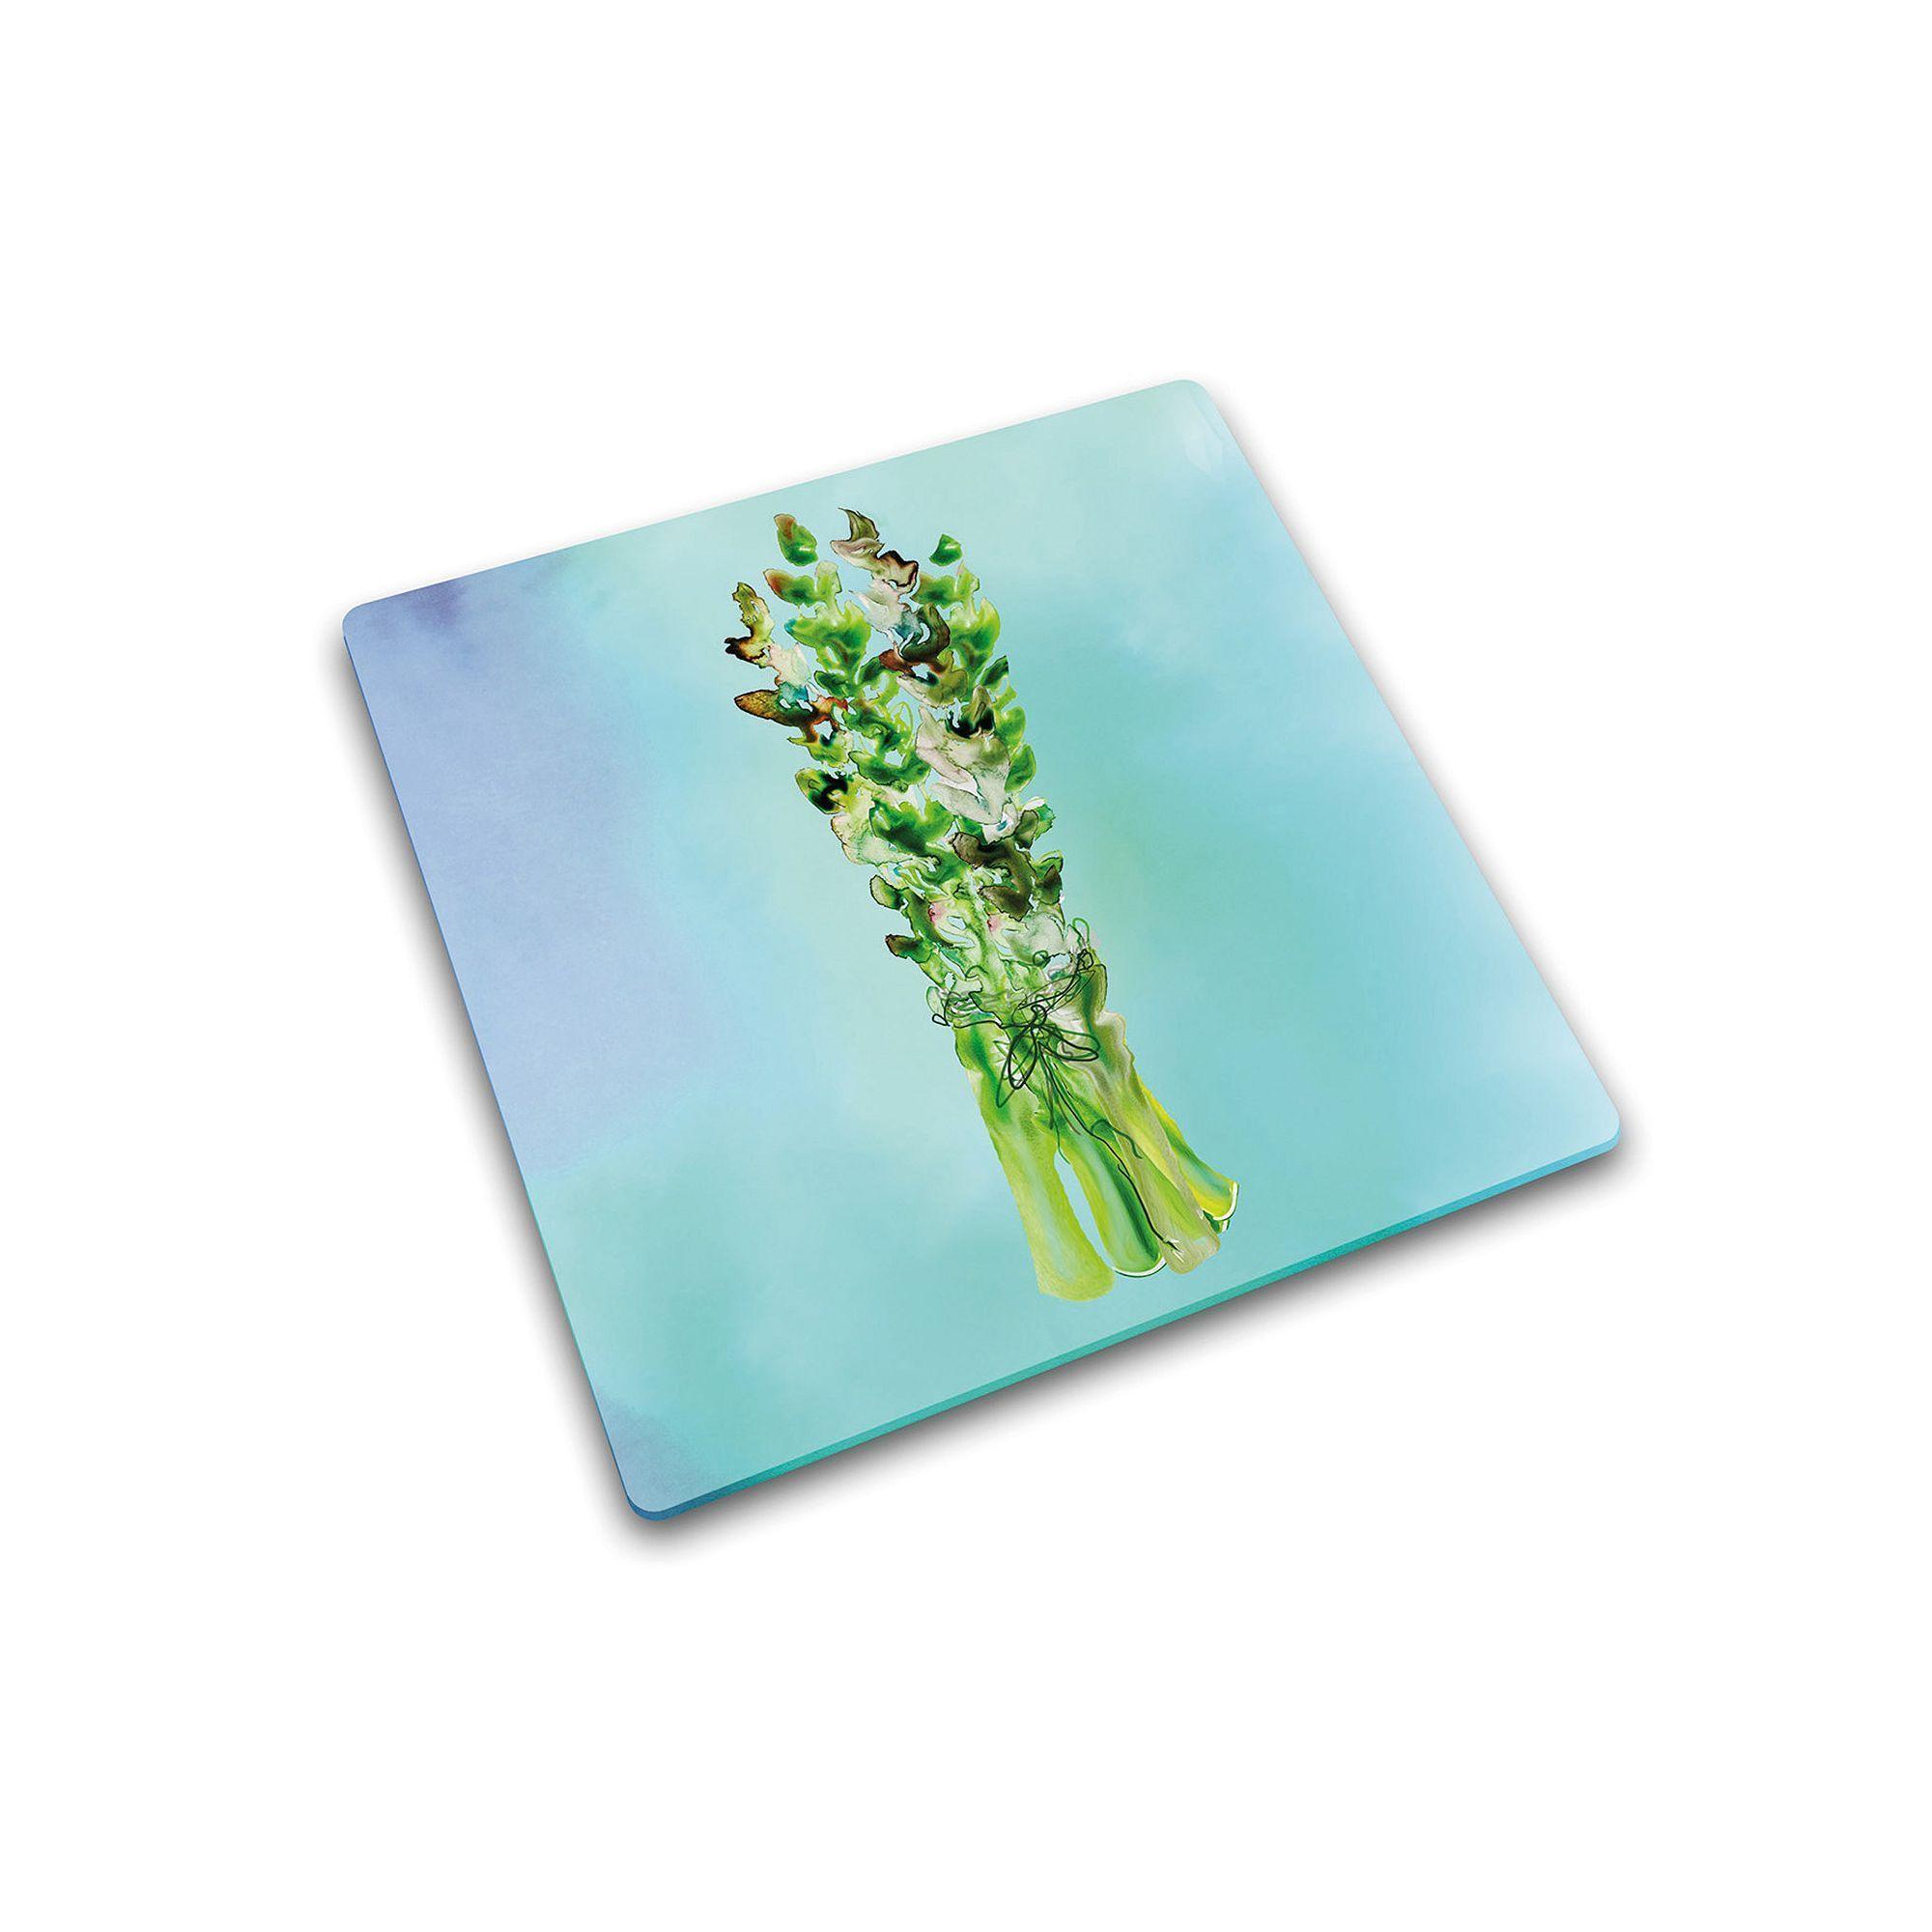 Joseph Joseph Asparagus Glass Chopping Board, Multicolor   Products ...